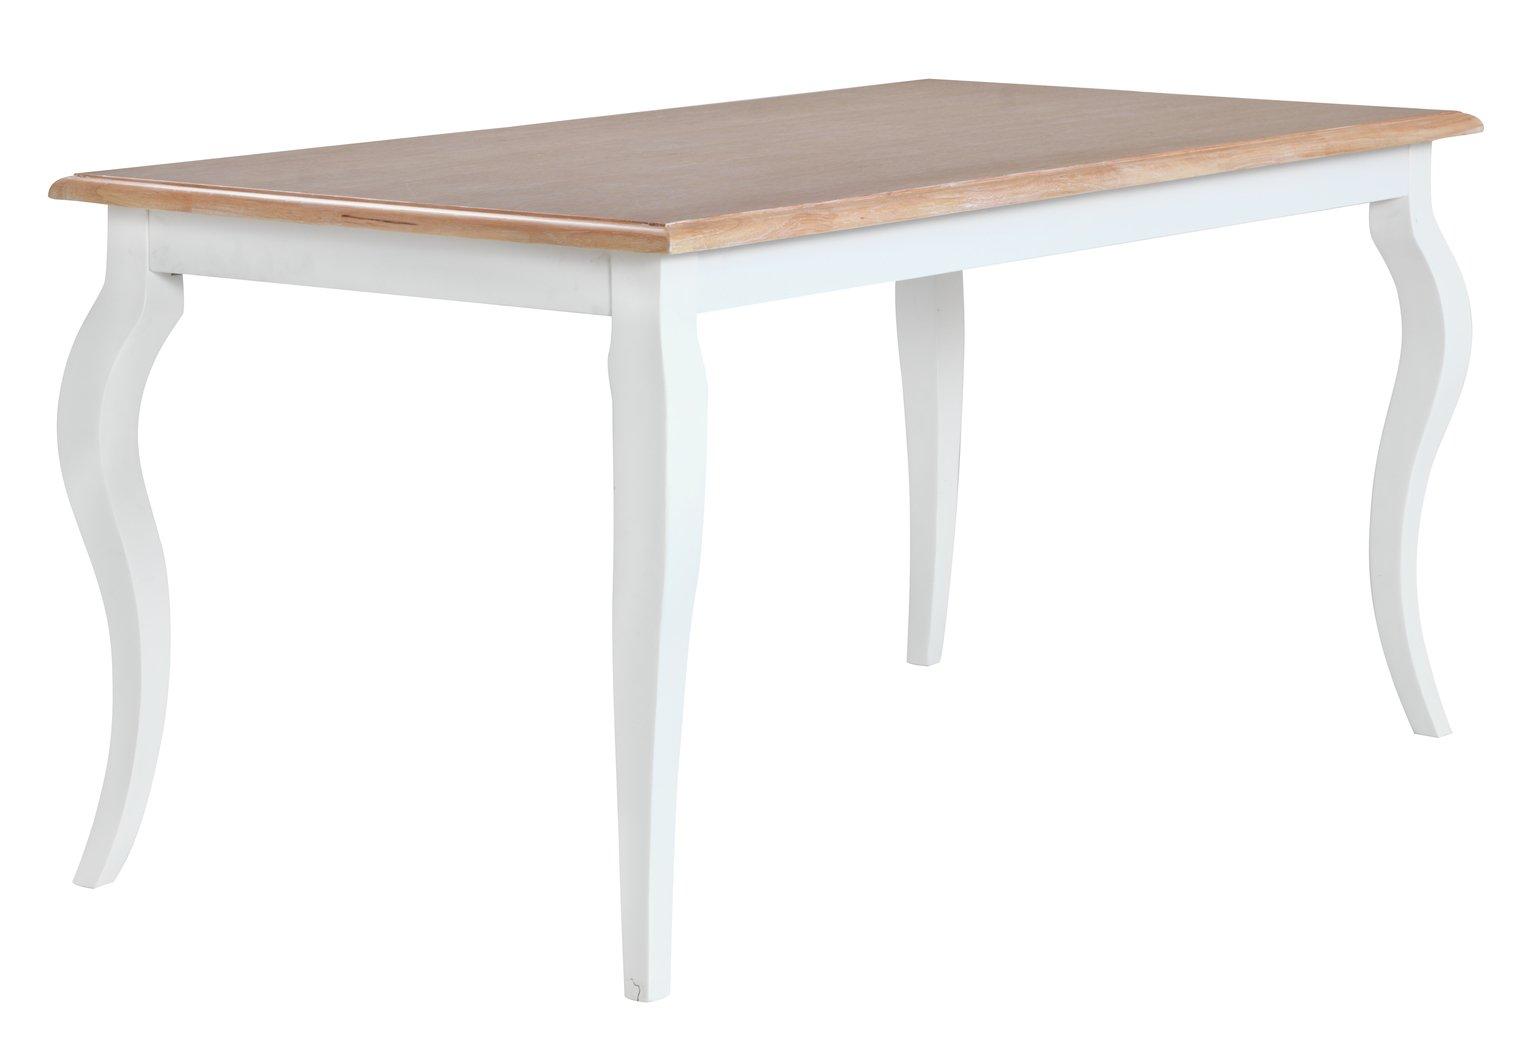 Argos Home Southwold Oak Veneer 6 Seater Table - Two Tone